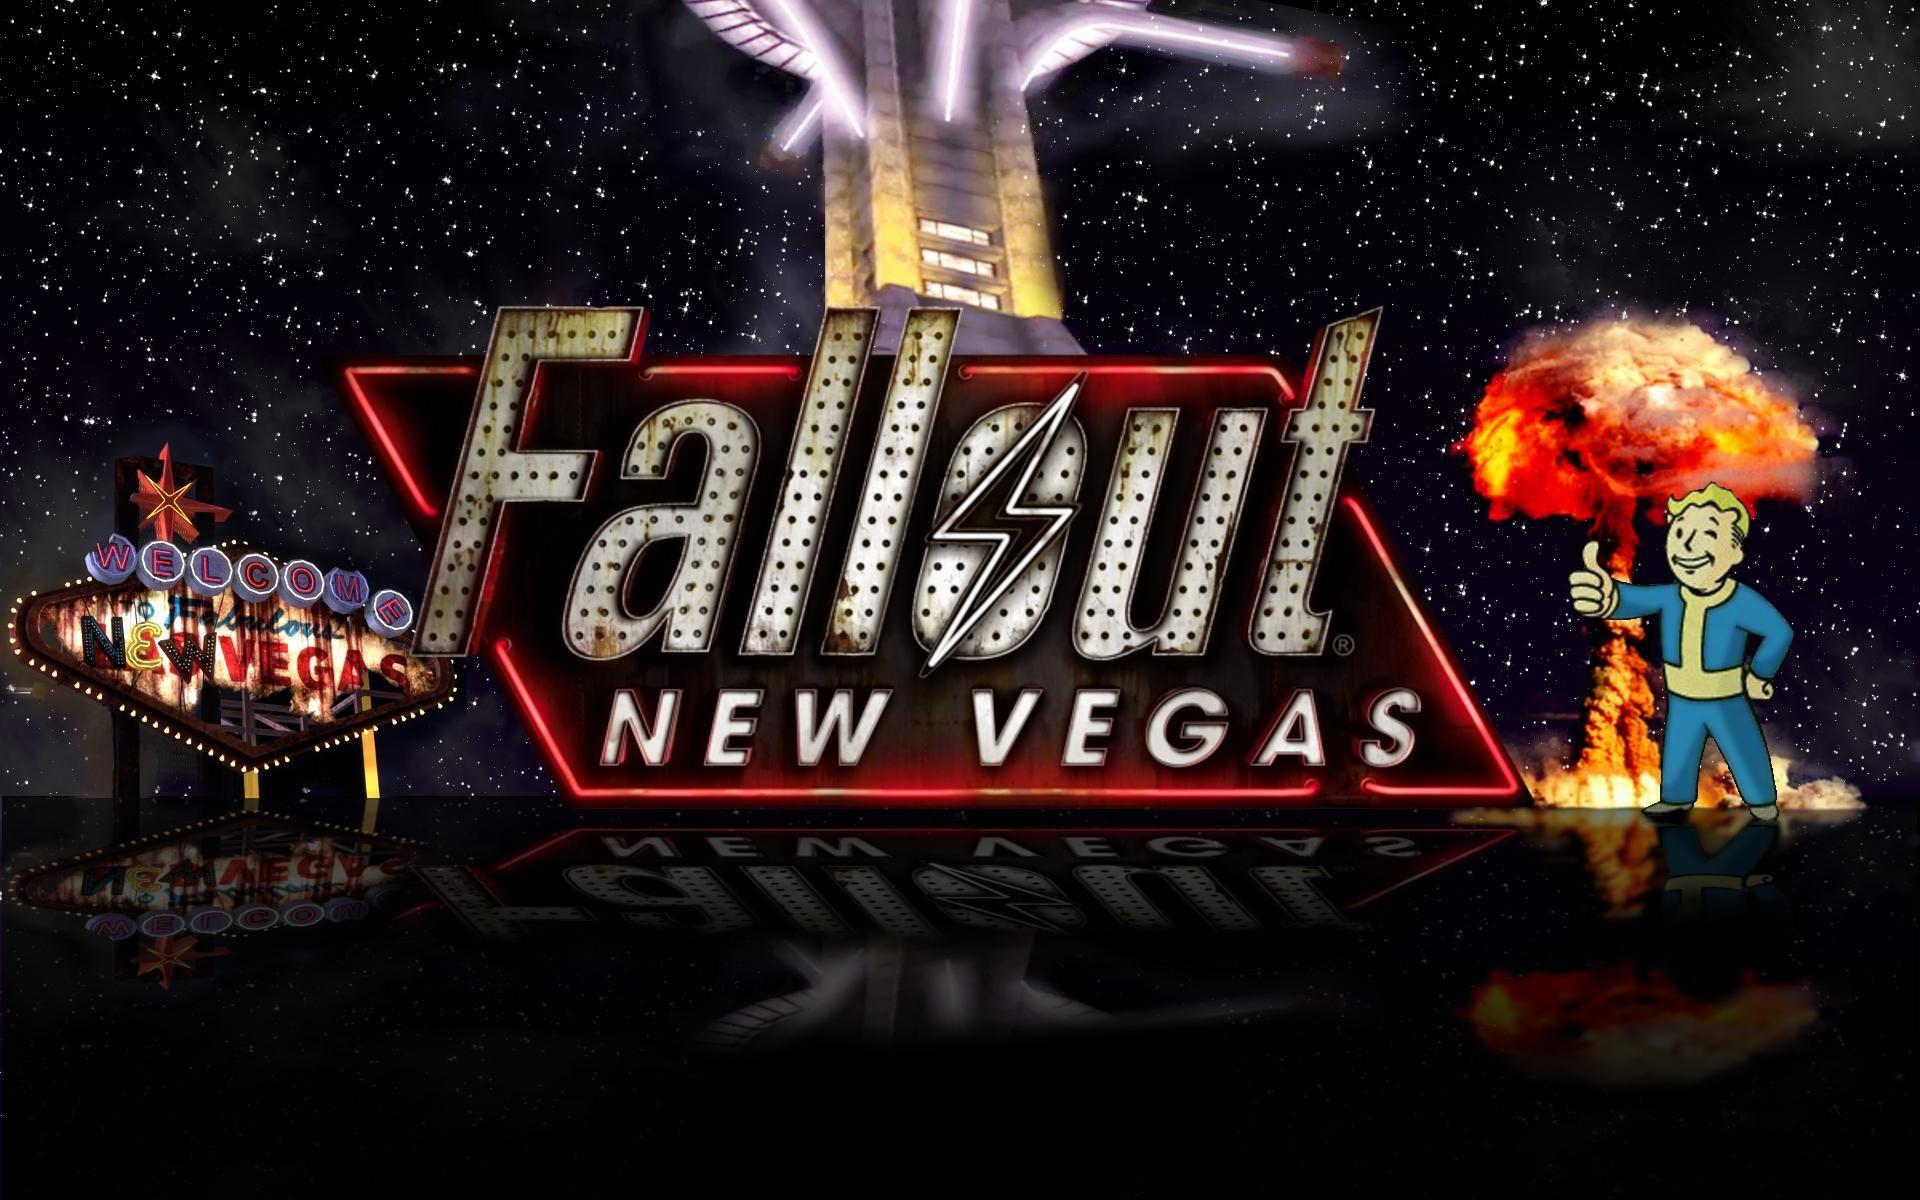 Fallout New Vegas Computer Wallpapers, Desktop Backgrounds